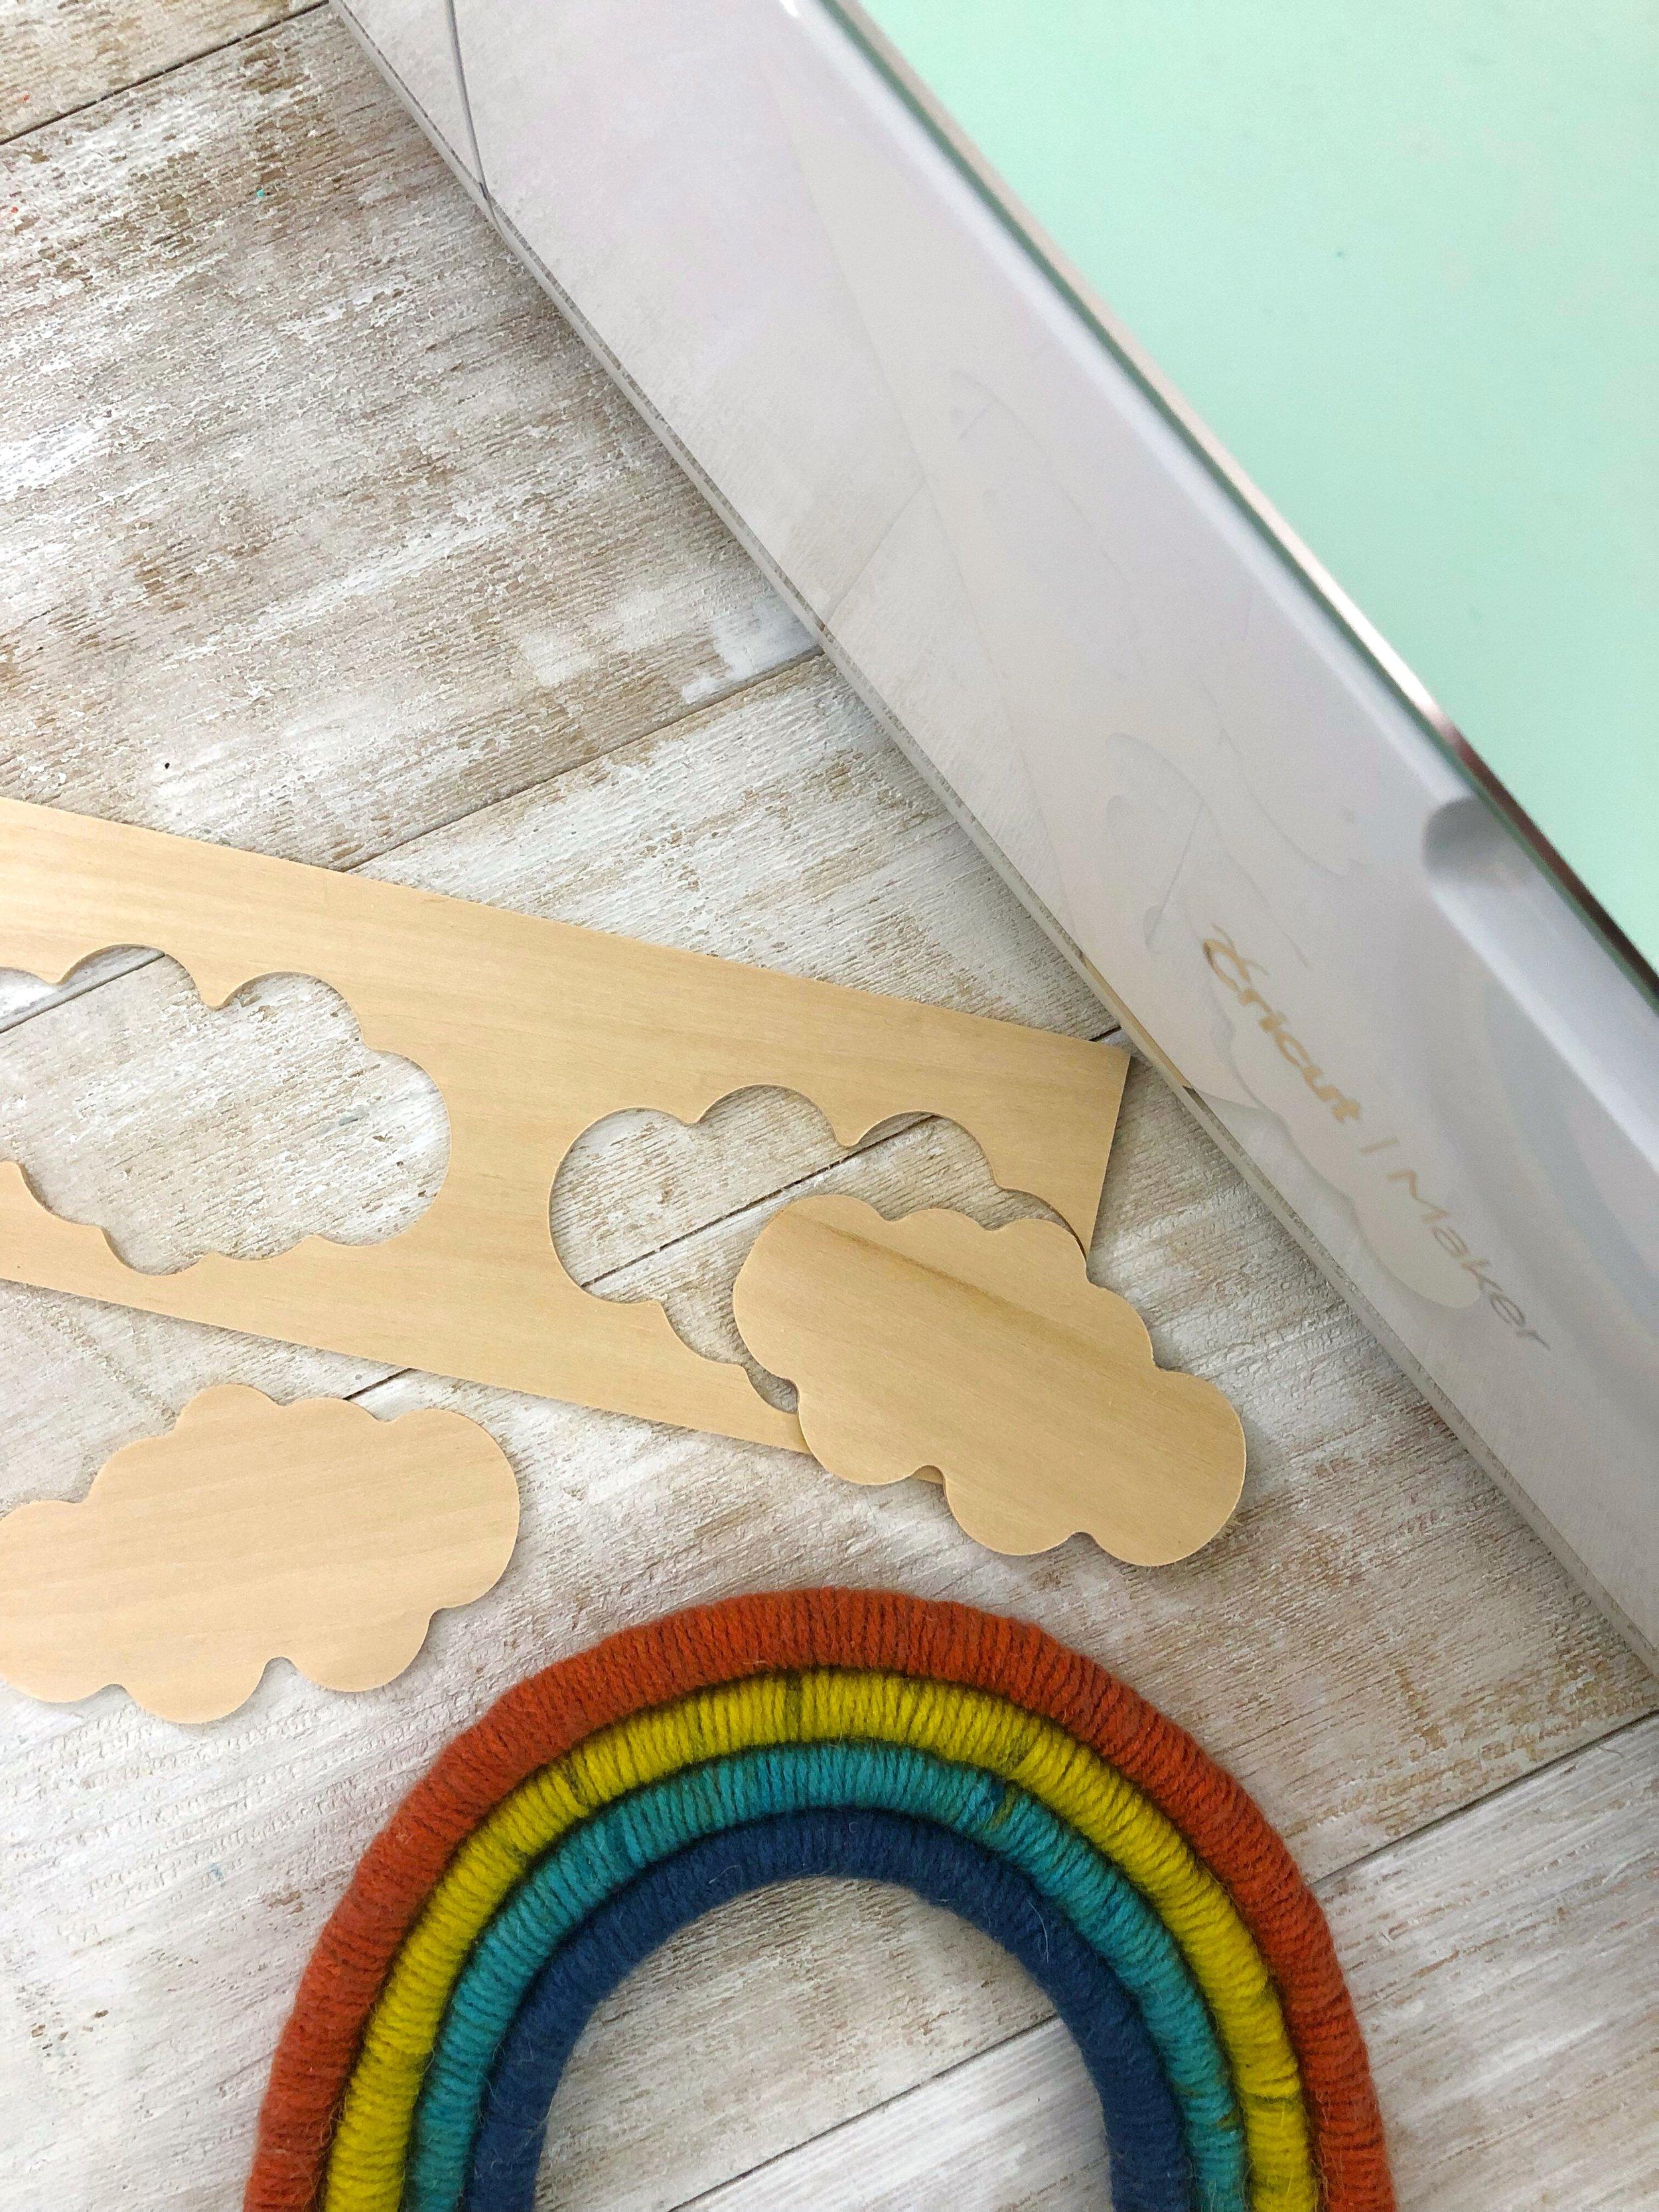 Rope Rainbow Wall Art Decor  #pride #yarn #wallart #walldecor #rainbow #rainbowcraft #summer #summerdiy #summercrafts #cricutmaker #cricut #balsawood #nursery #basswood #homedecor #yarncraft #yarnprojects #gaypride #colorblocking